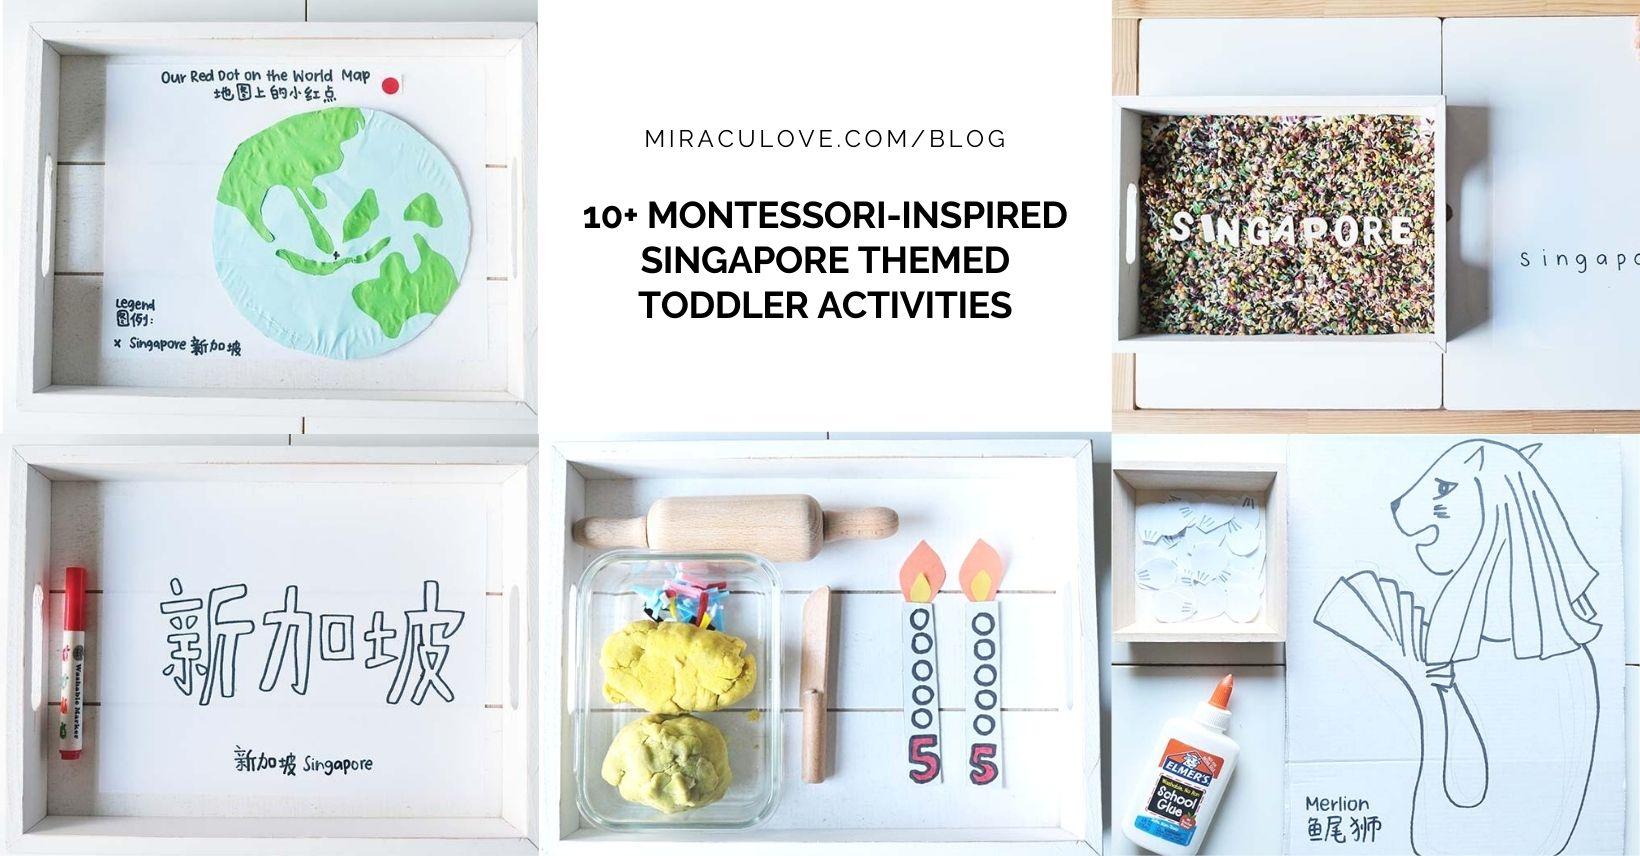 10+ Montessori-Inspired Singapore Themed Toddler Activities